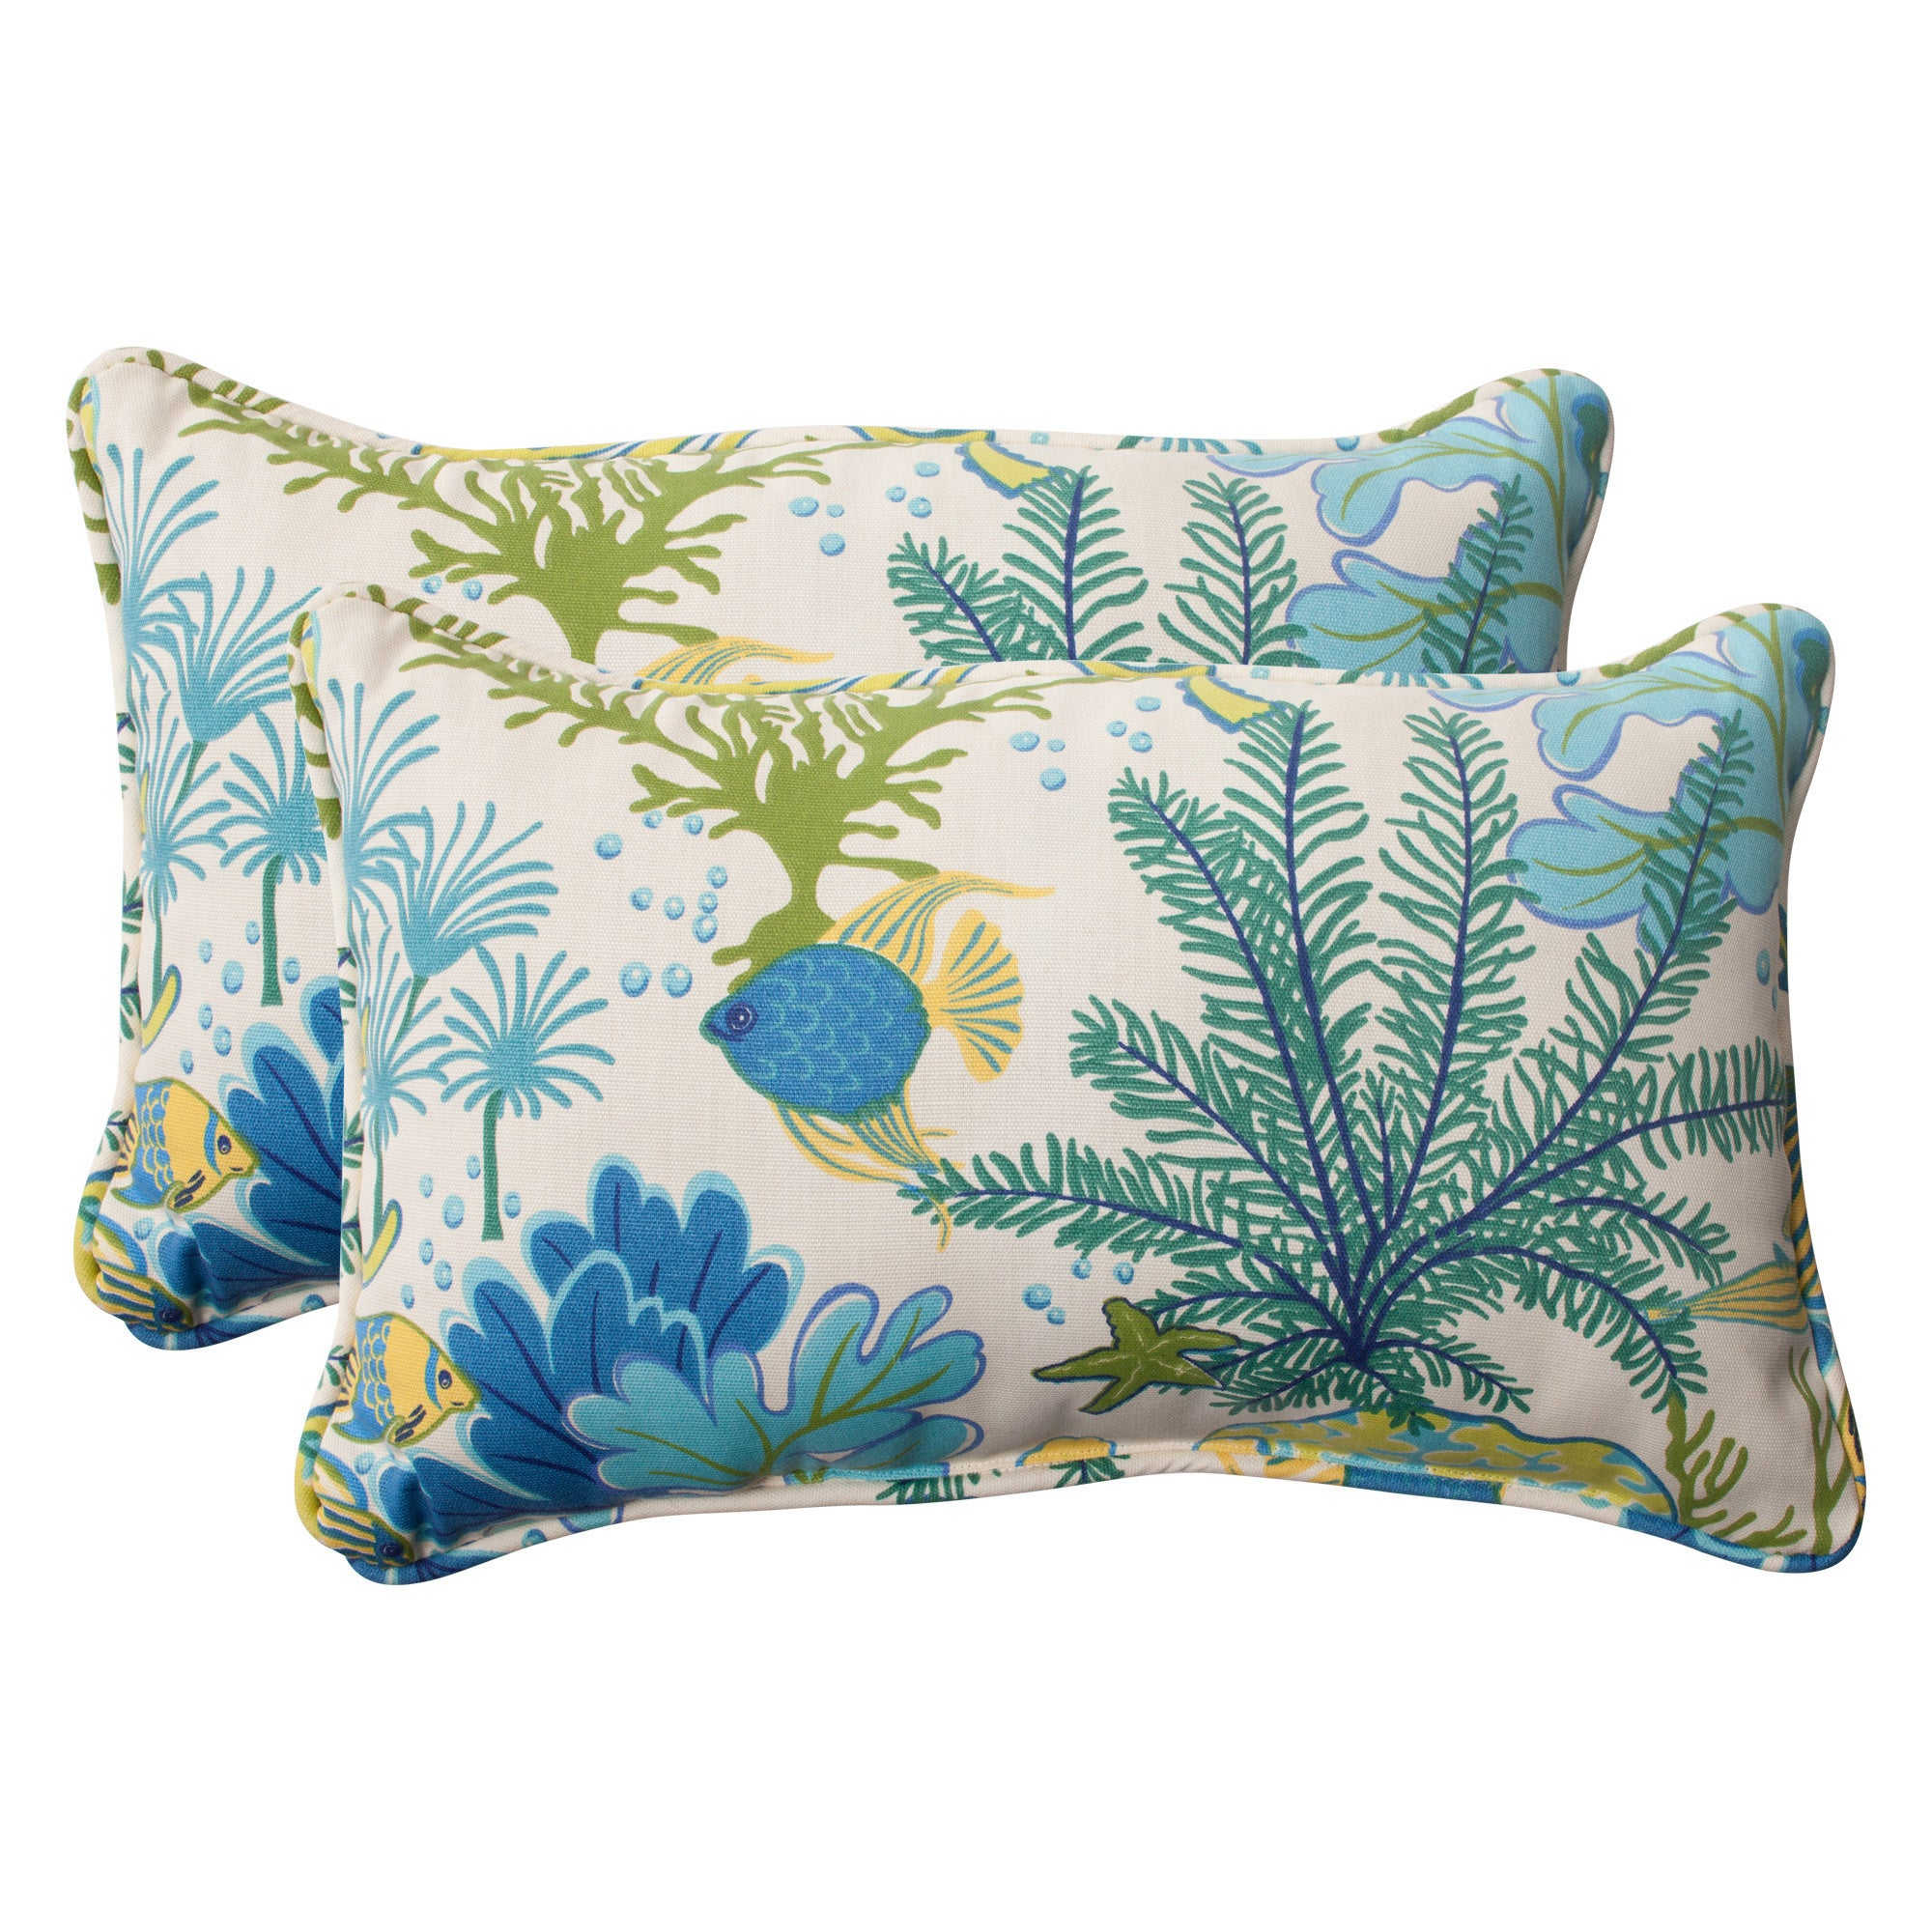 Pillow Perfect Splish Splash Outdoor Throw Pillows Set Of 2 Overstock 7847493 Splish Splash Blue